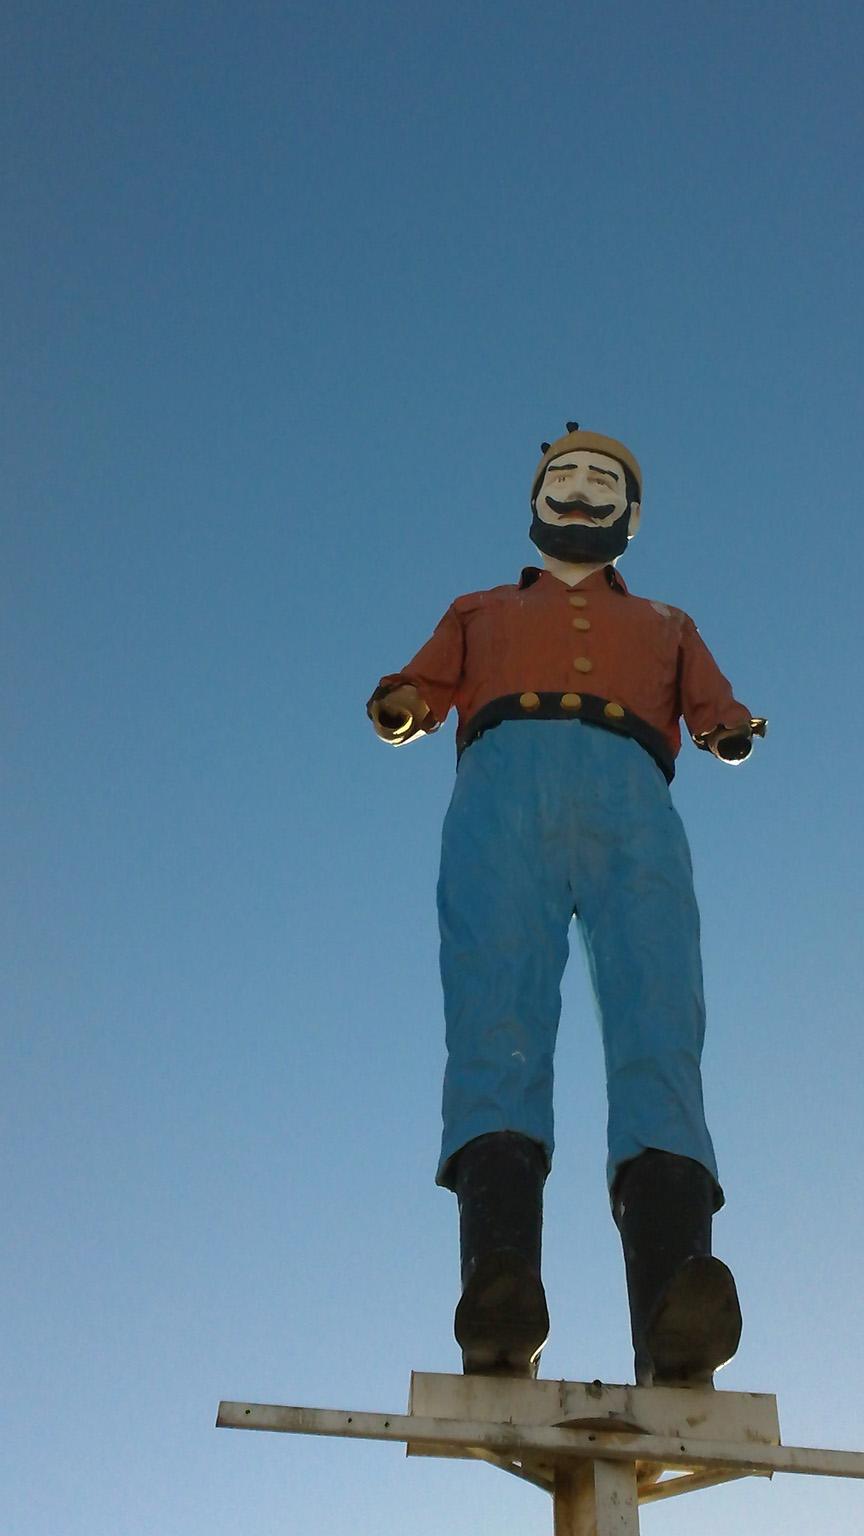 Lumberjack (cropped) -- ISO 50, f2.8, 1/1000 sec.